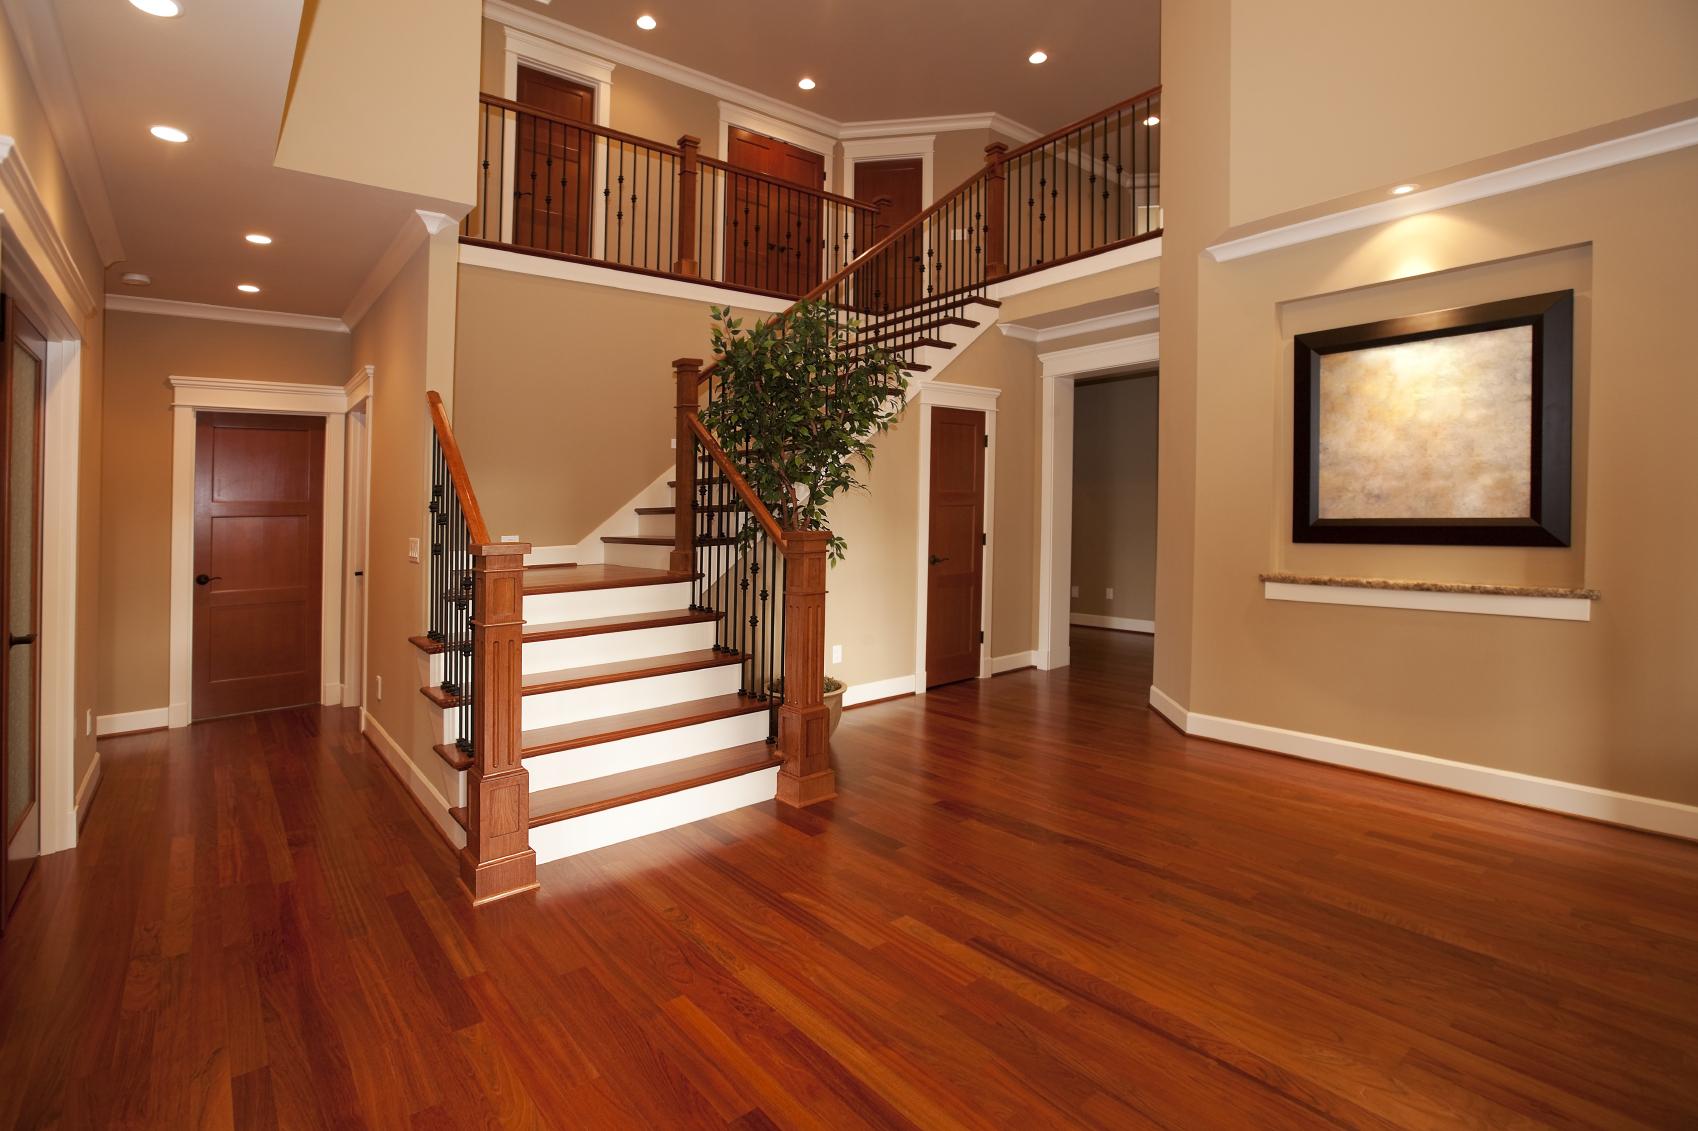 Hardwood Flooring 2013 by Metro Atl. Floors Inc. in Atlanta Georgia